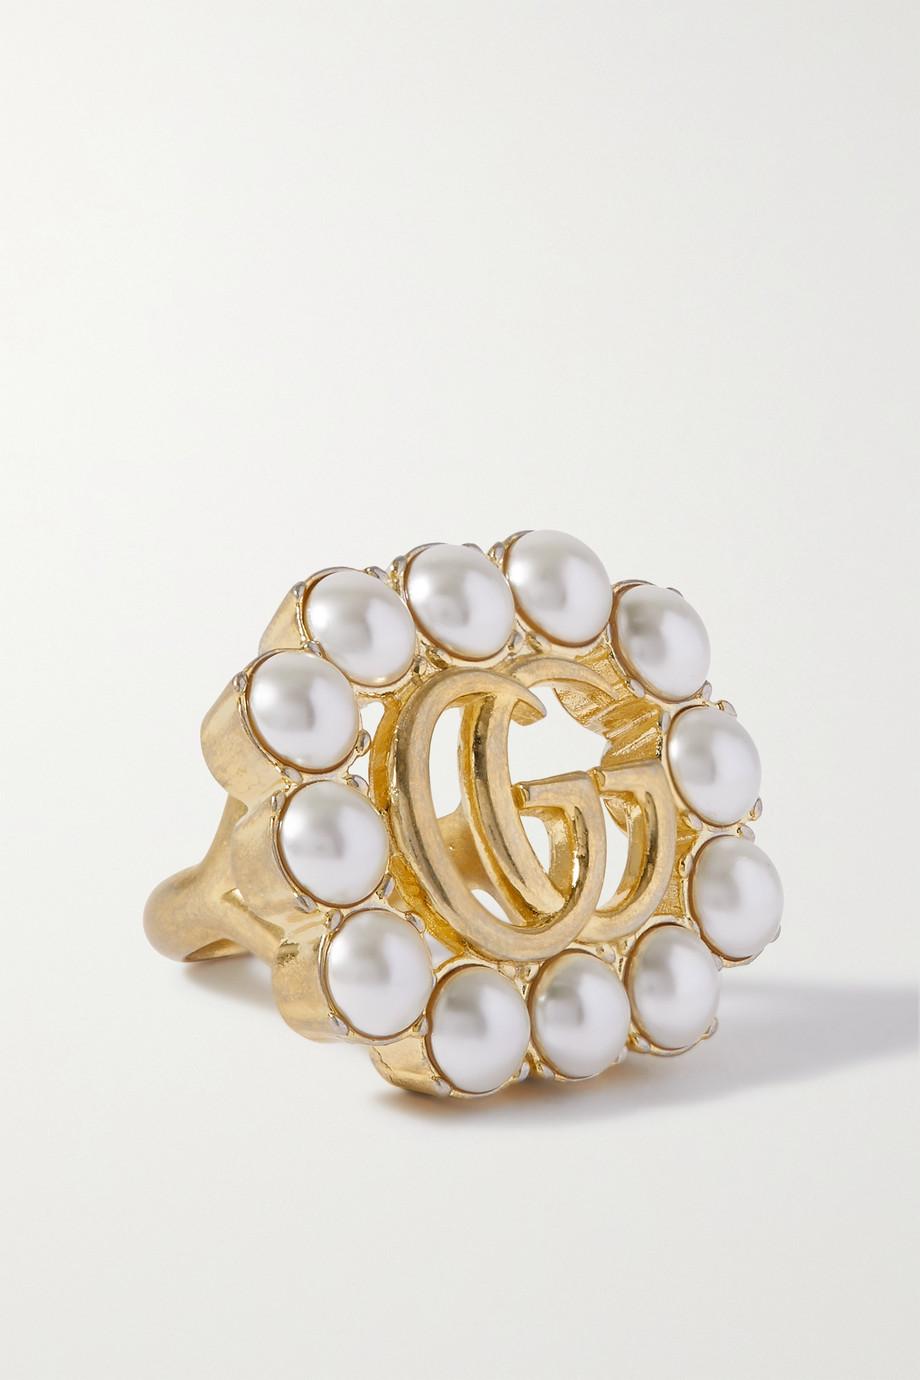 Gucci GG Marmont 人造珍珠金色戒指